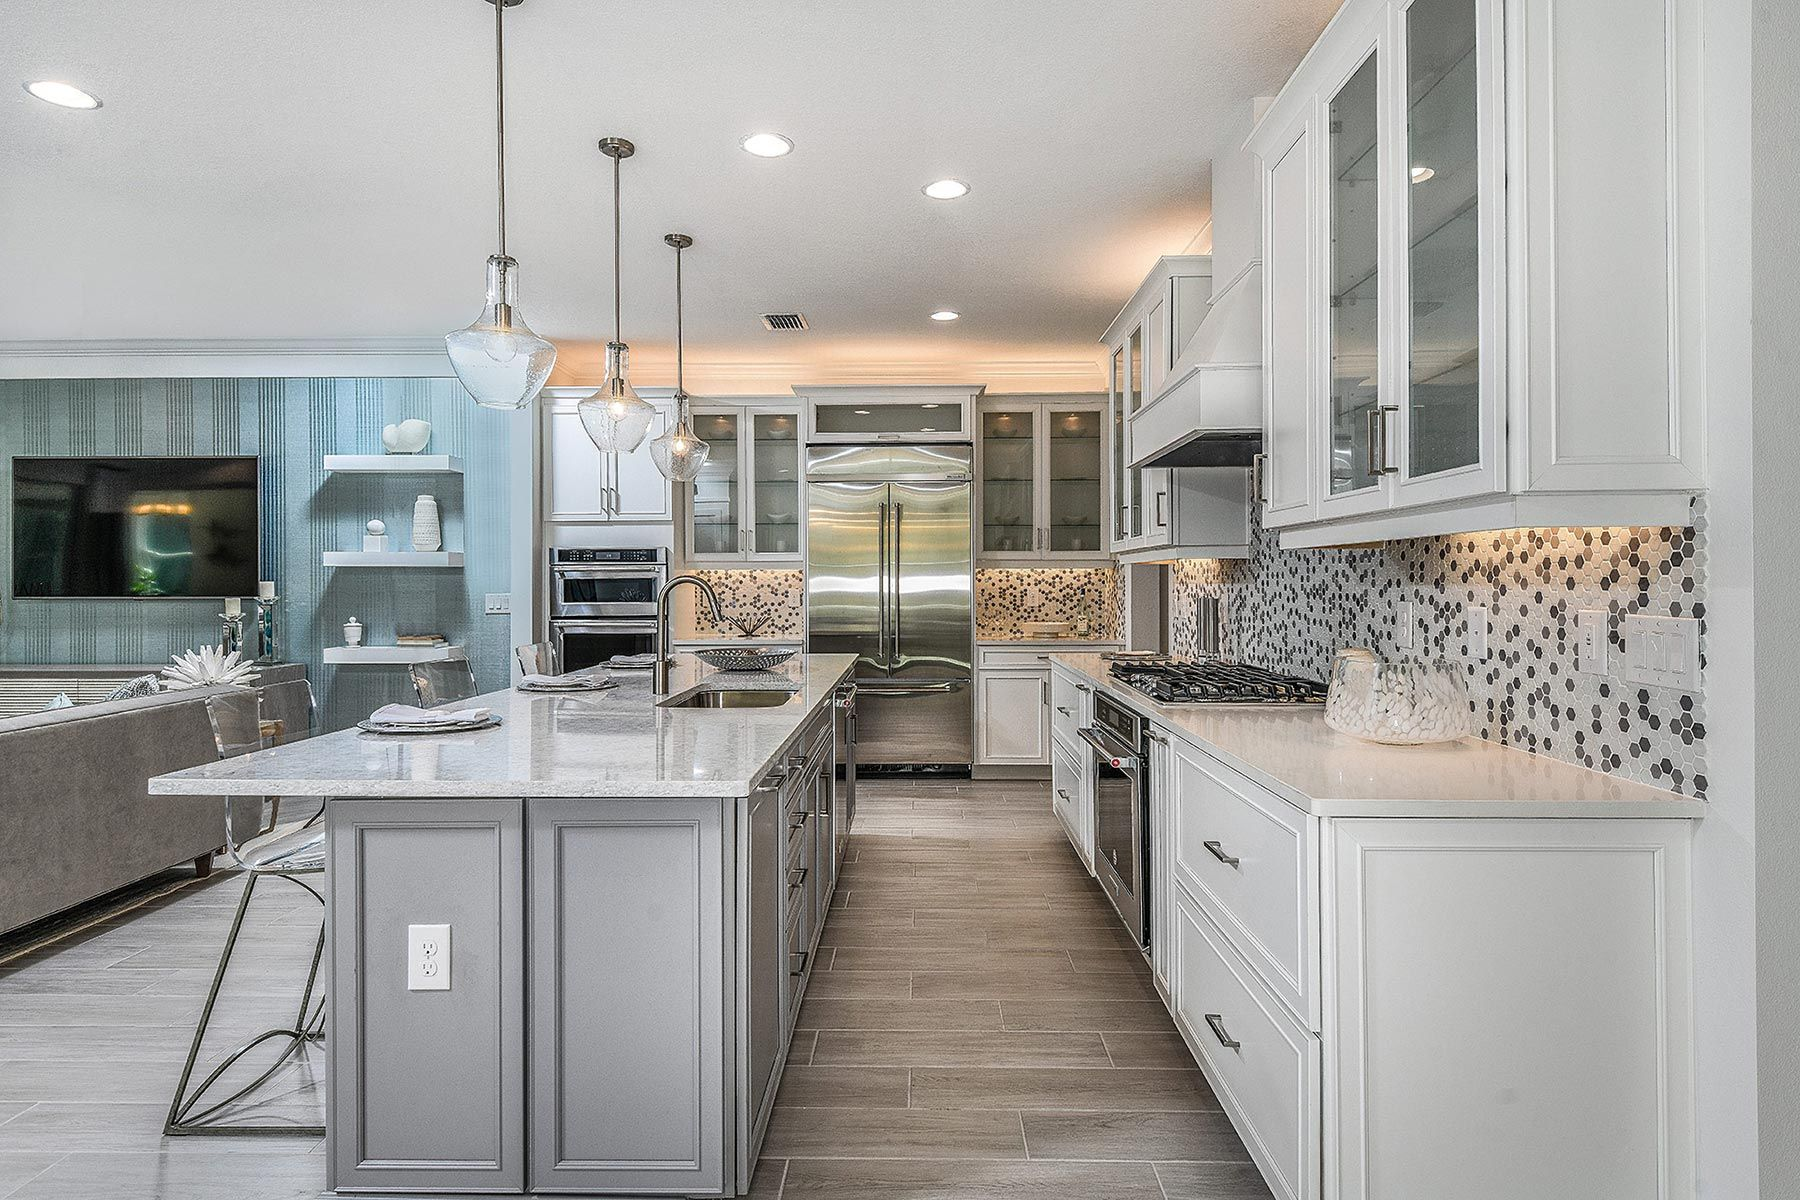 Kitchen featured in the Jubilee II By Mattamy Homes in Sarasota-Bradenton, FL